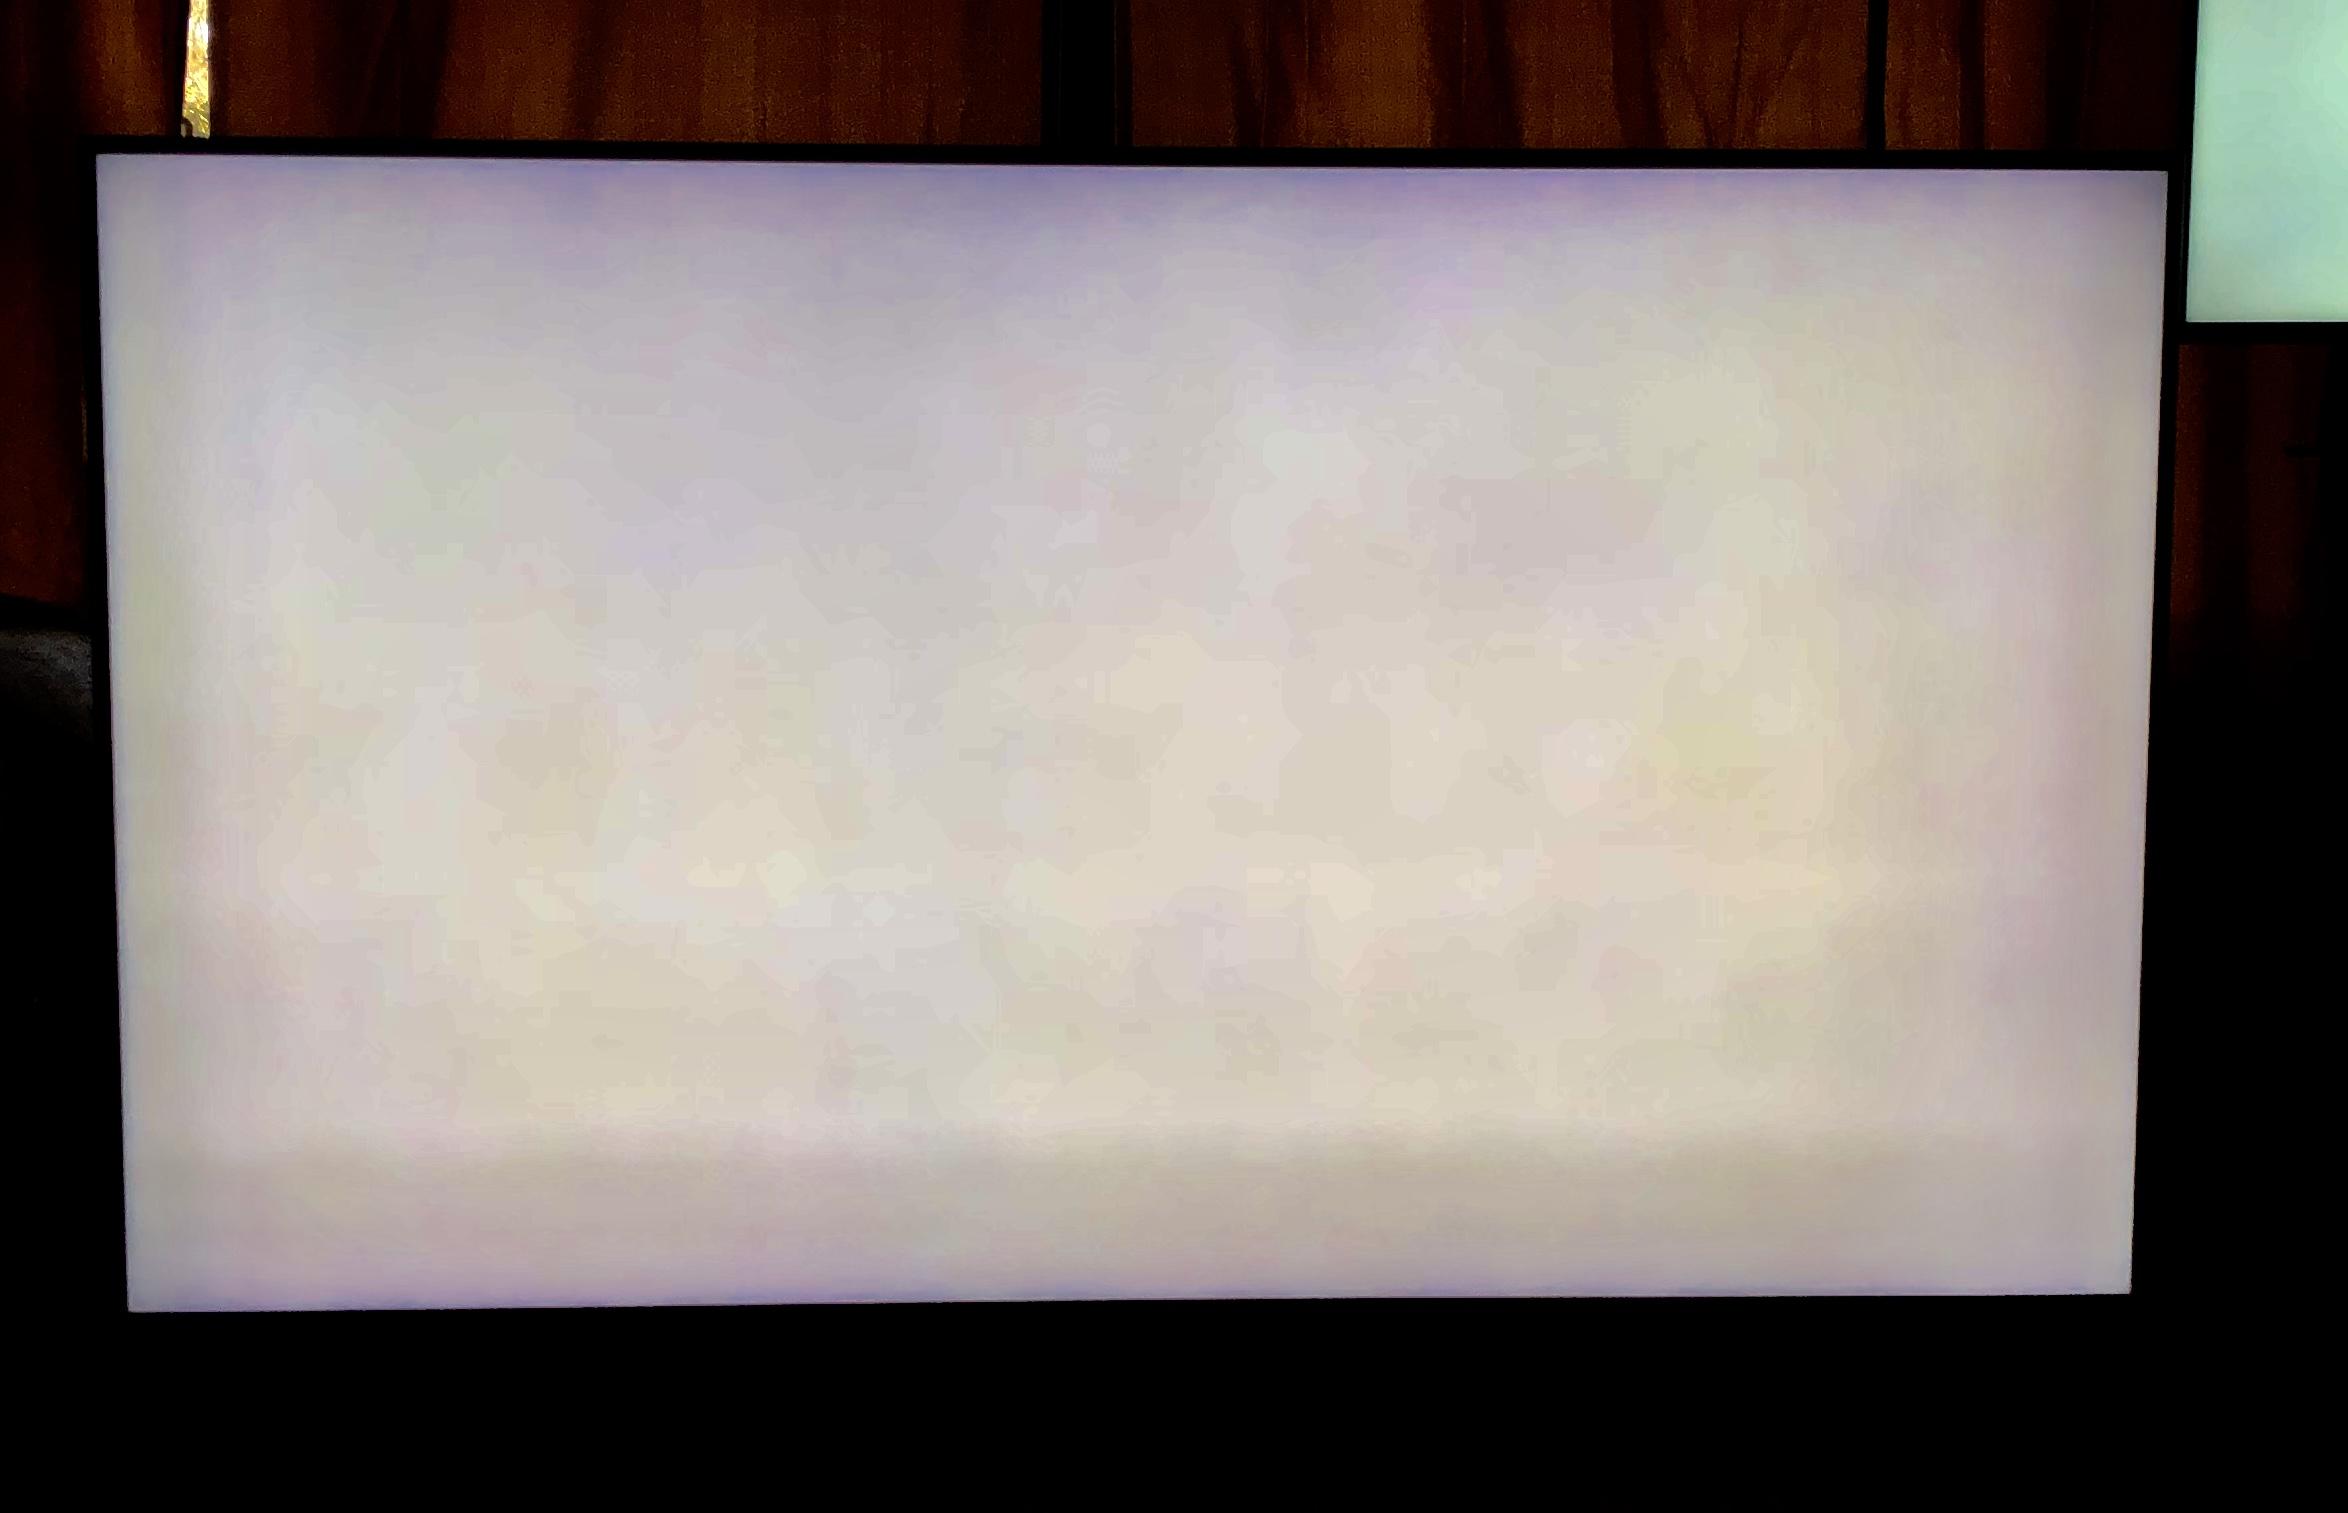 Q8FN Screen Defect? - Samsung Community